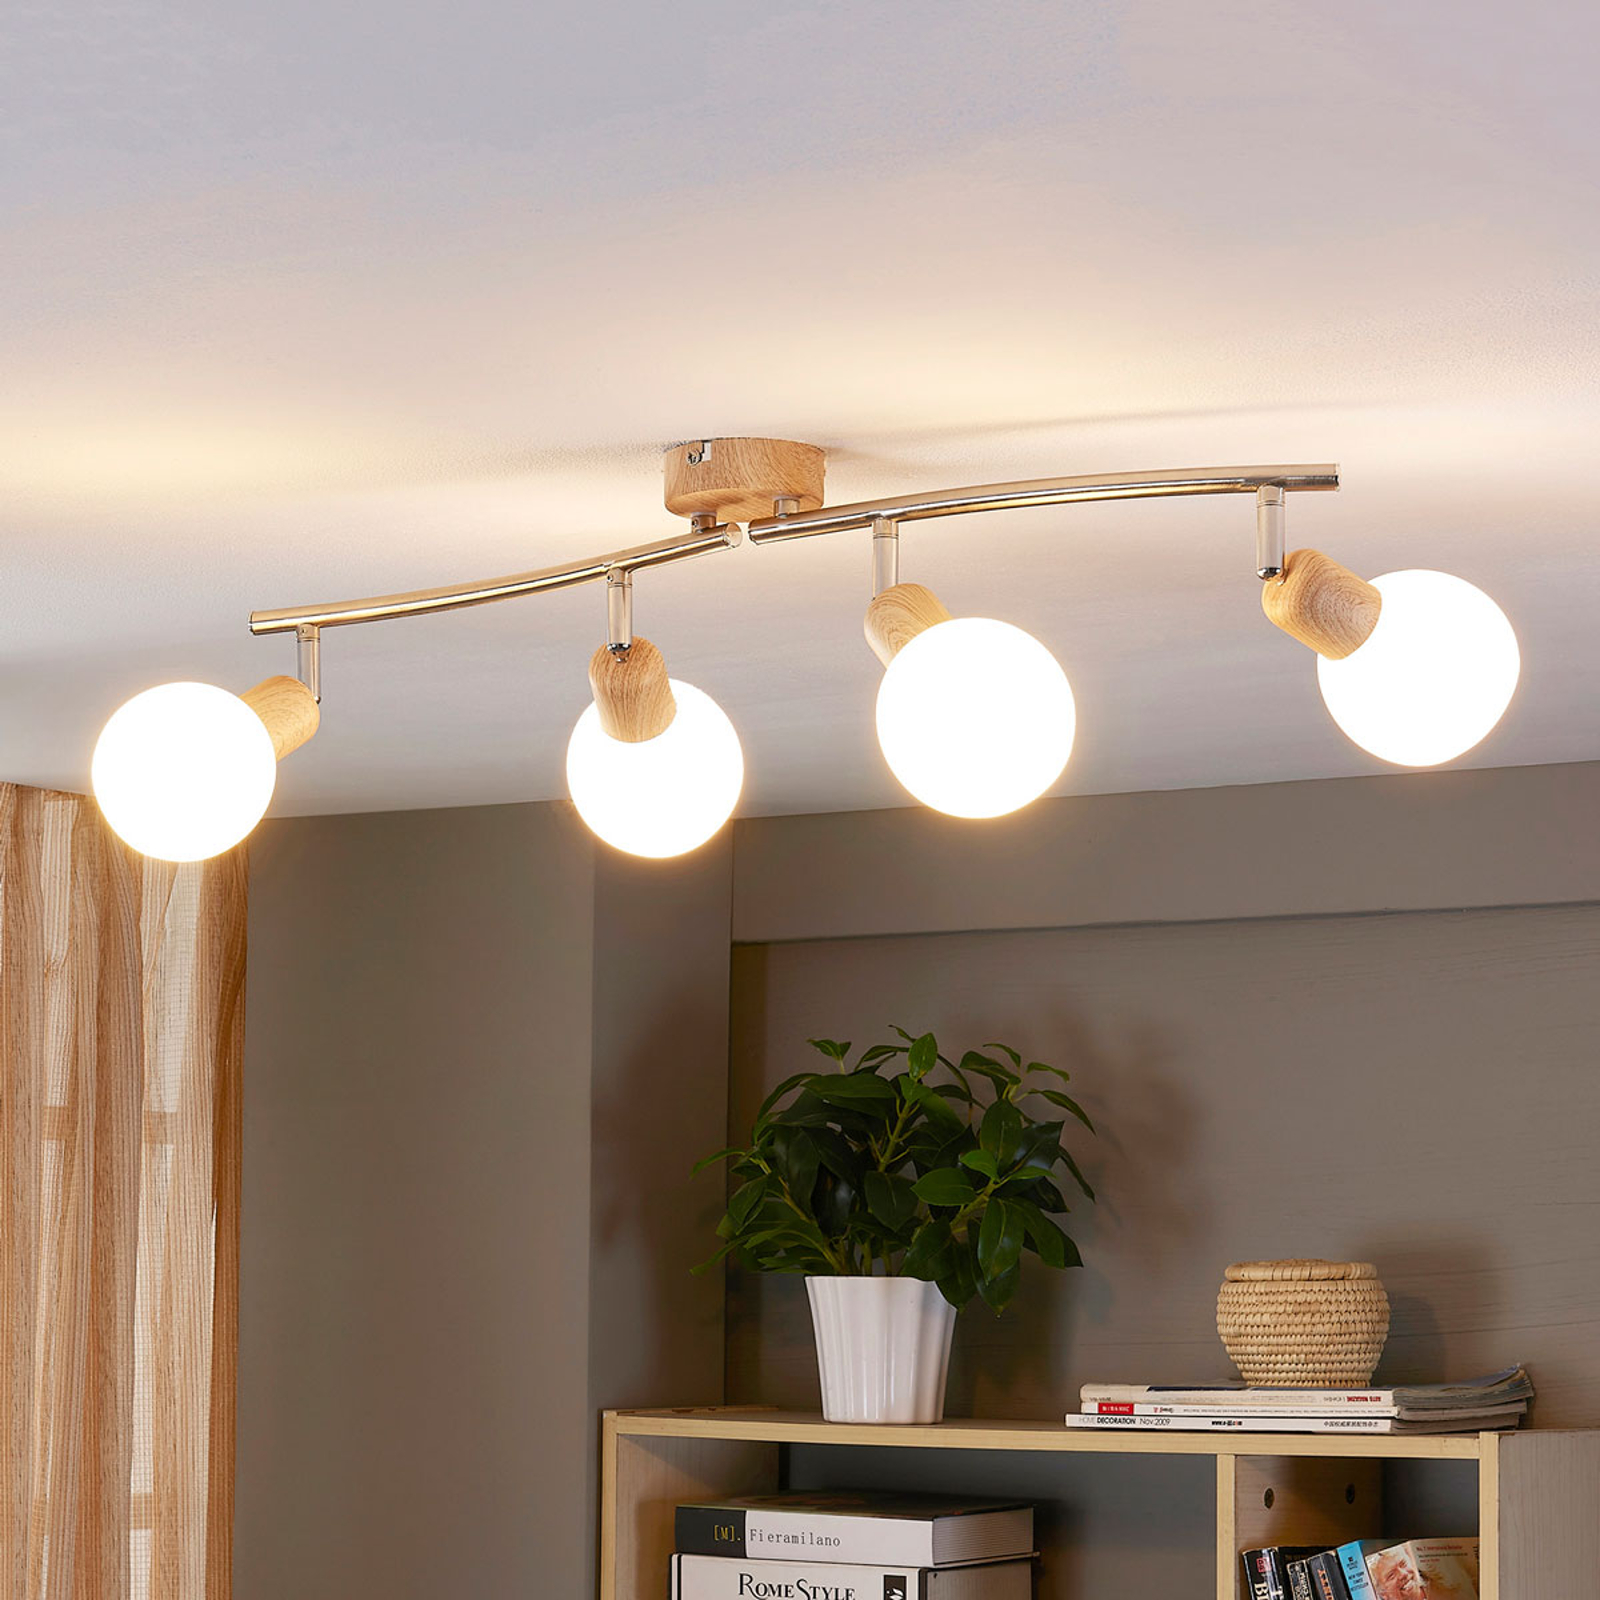 Plafonnier LED en bois Svenka à 4 lampes